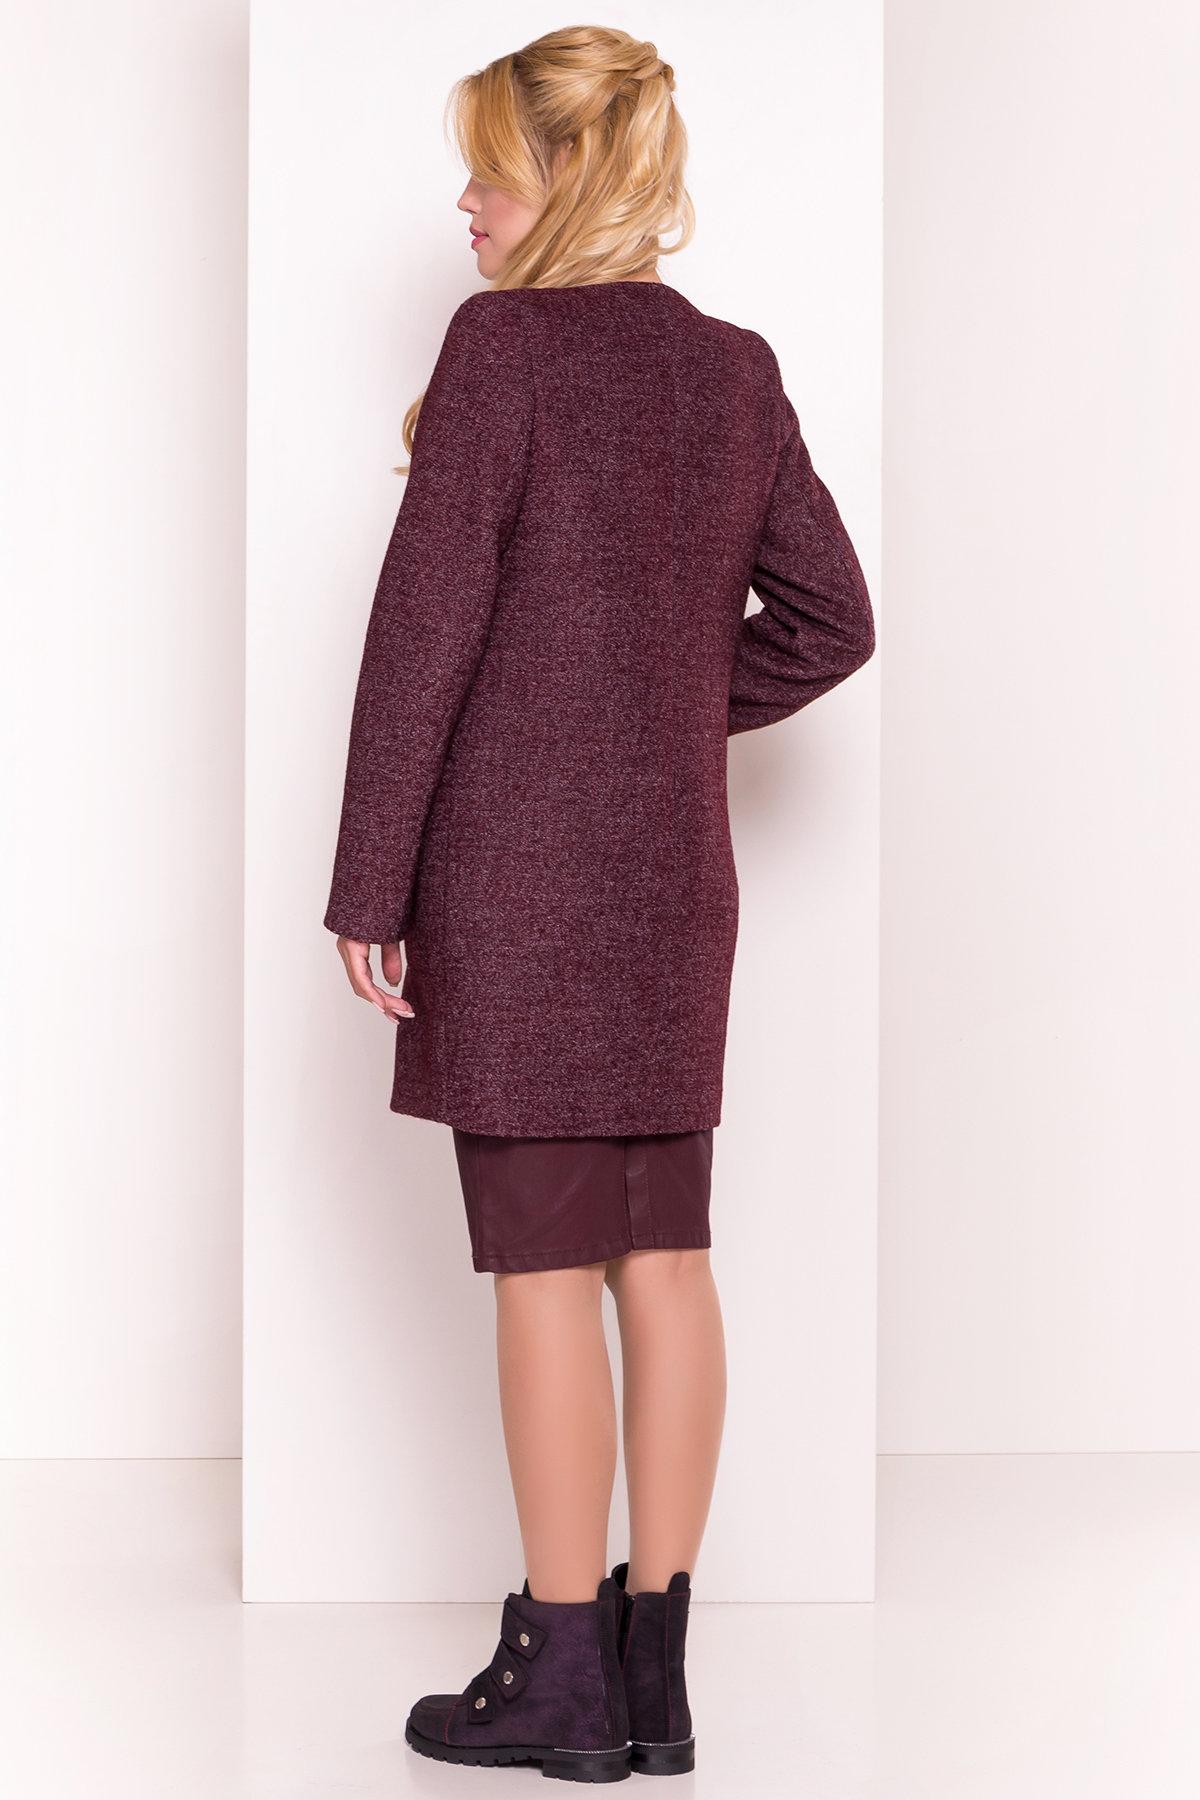 Пальто на весну Дакс 1679 АРТ. 16668 Цвет: Марсала - фото 4, интернет магазин tm-modus.ru